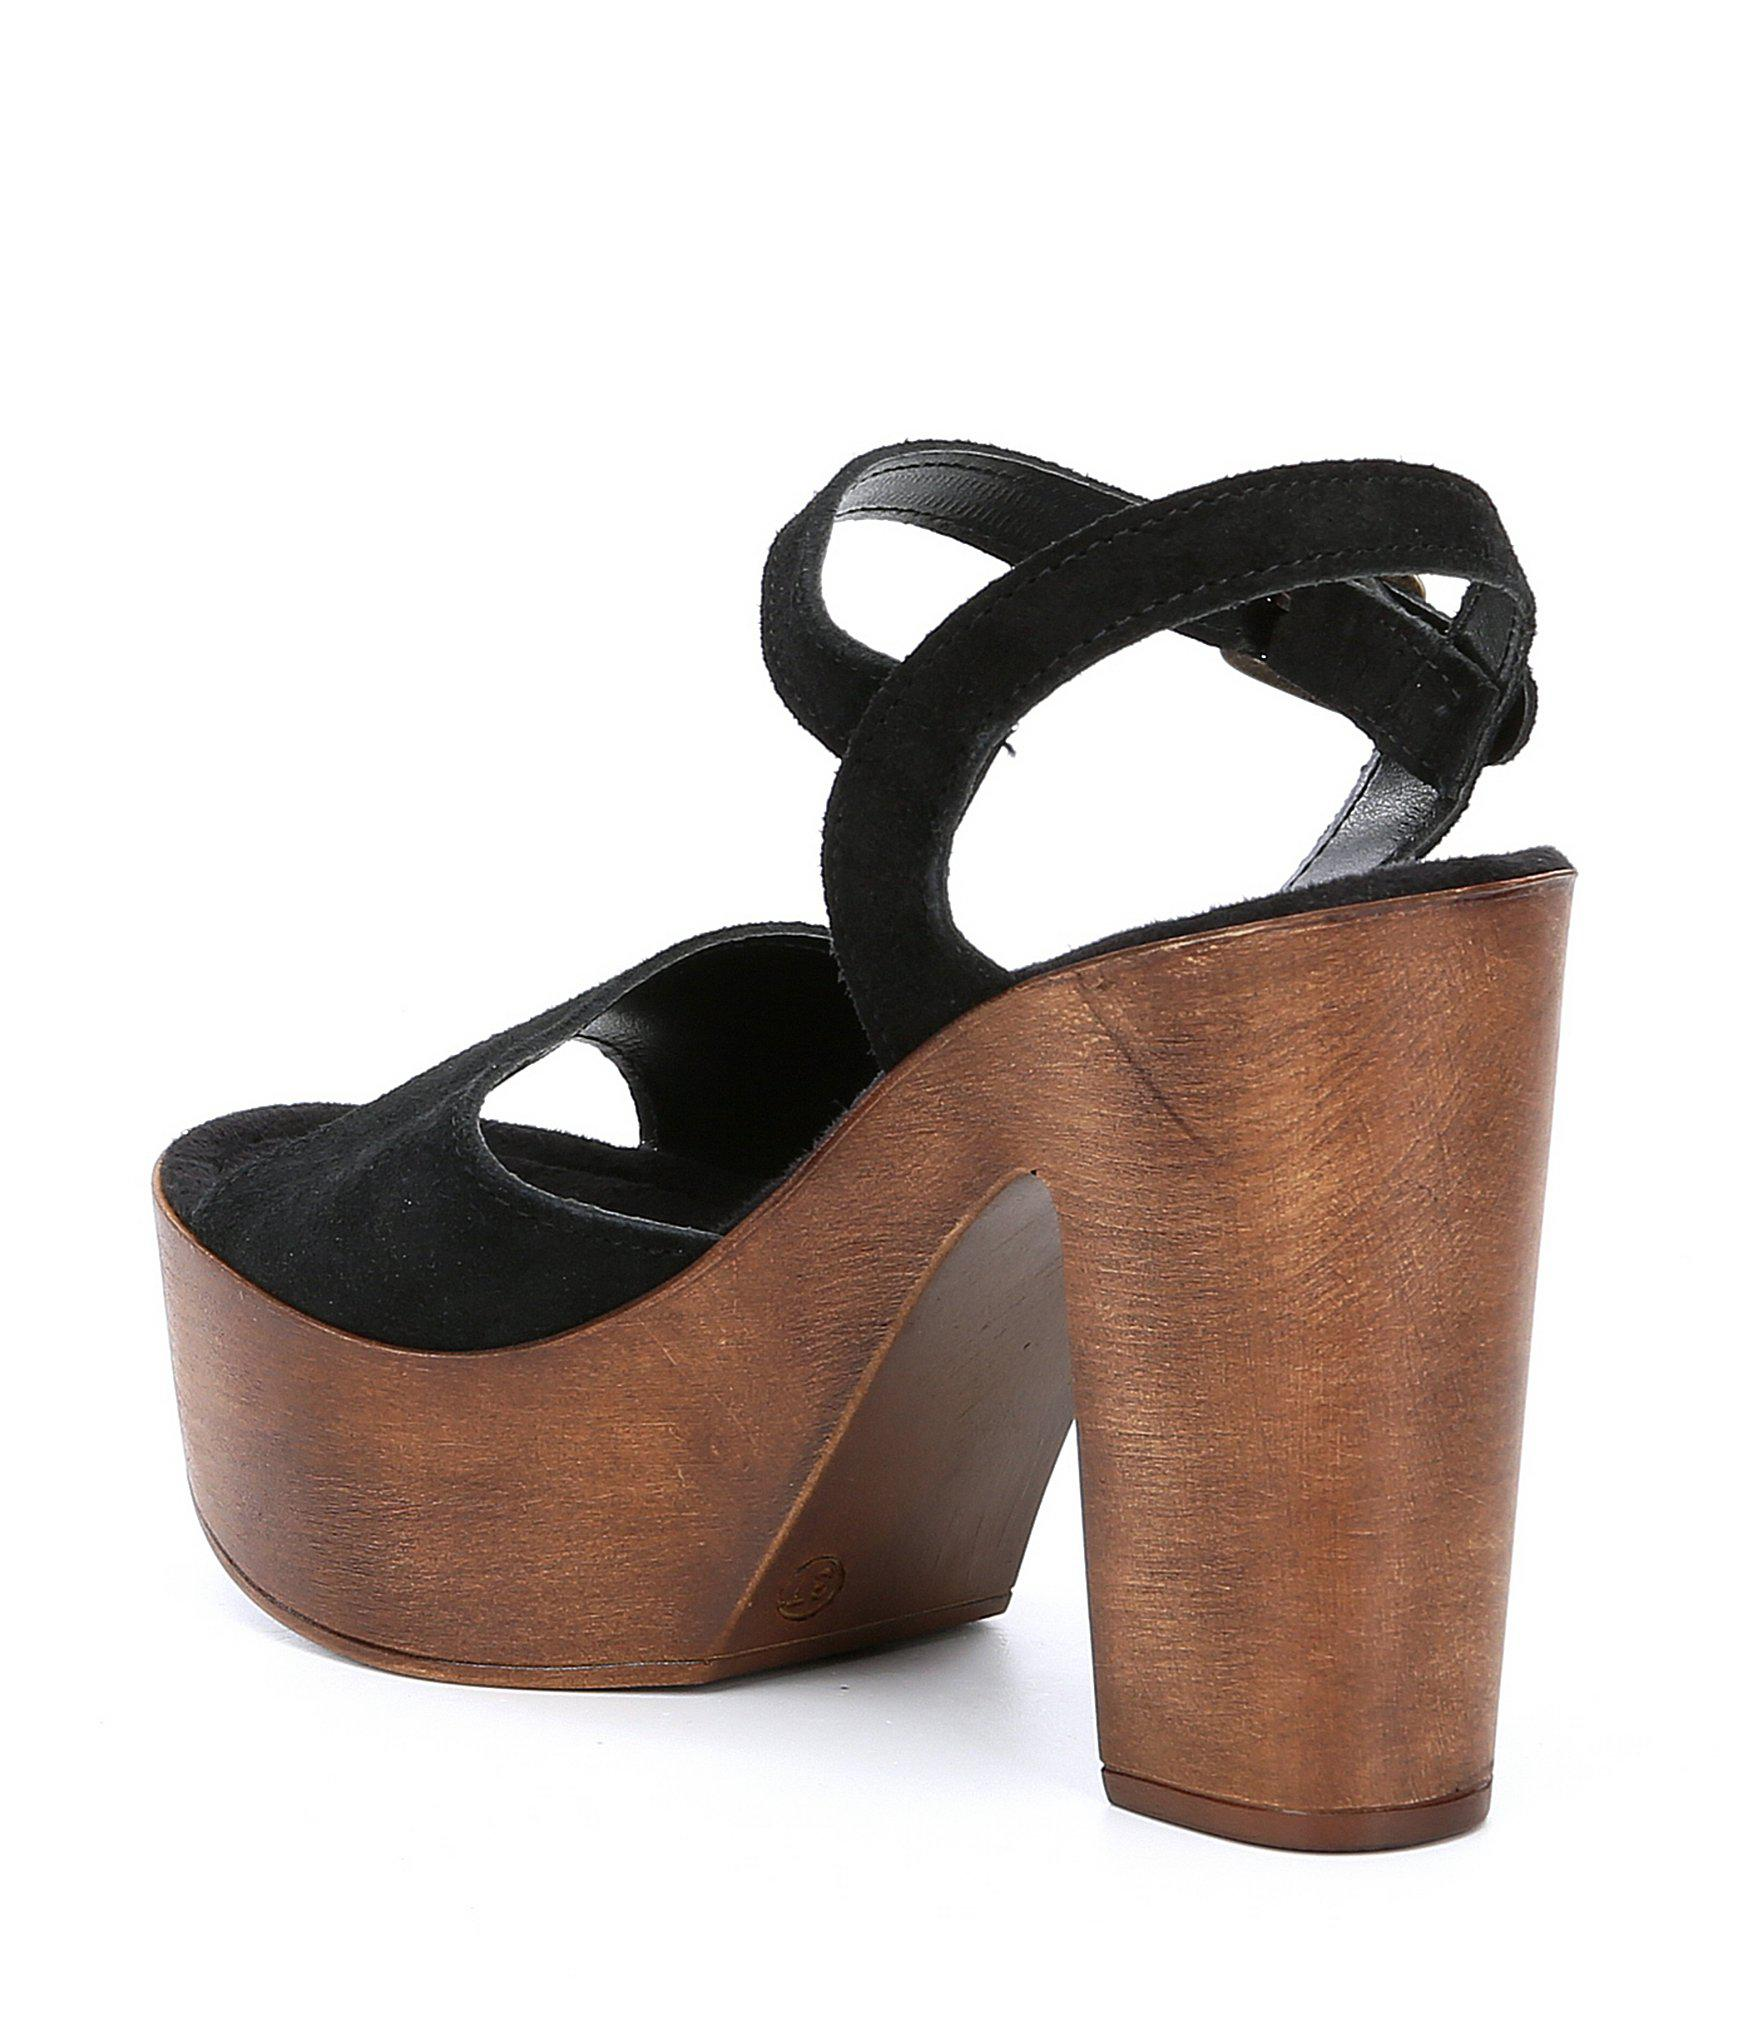 7396d8078e20 Lyst - Steve Madden Lulla Suede Platform Block Heel Sandals in Black